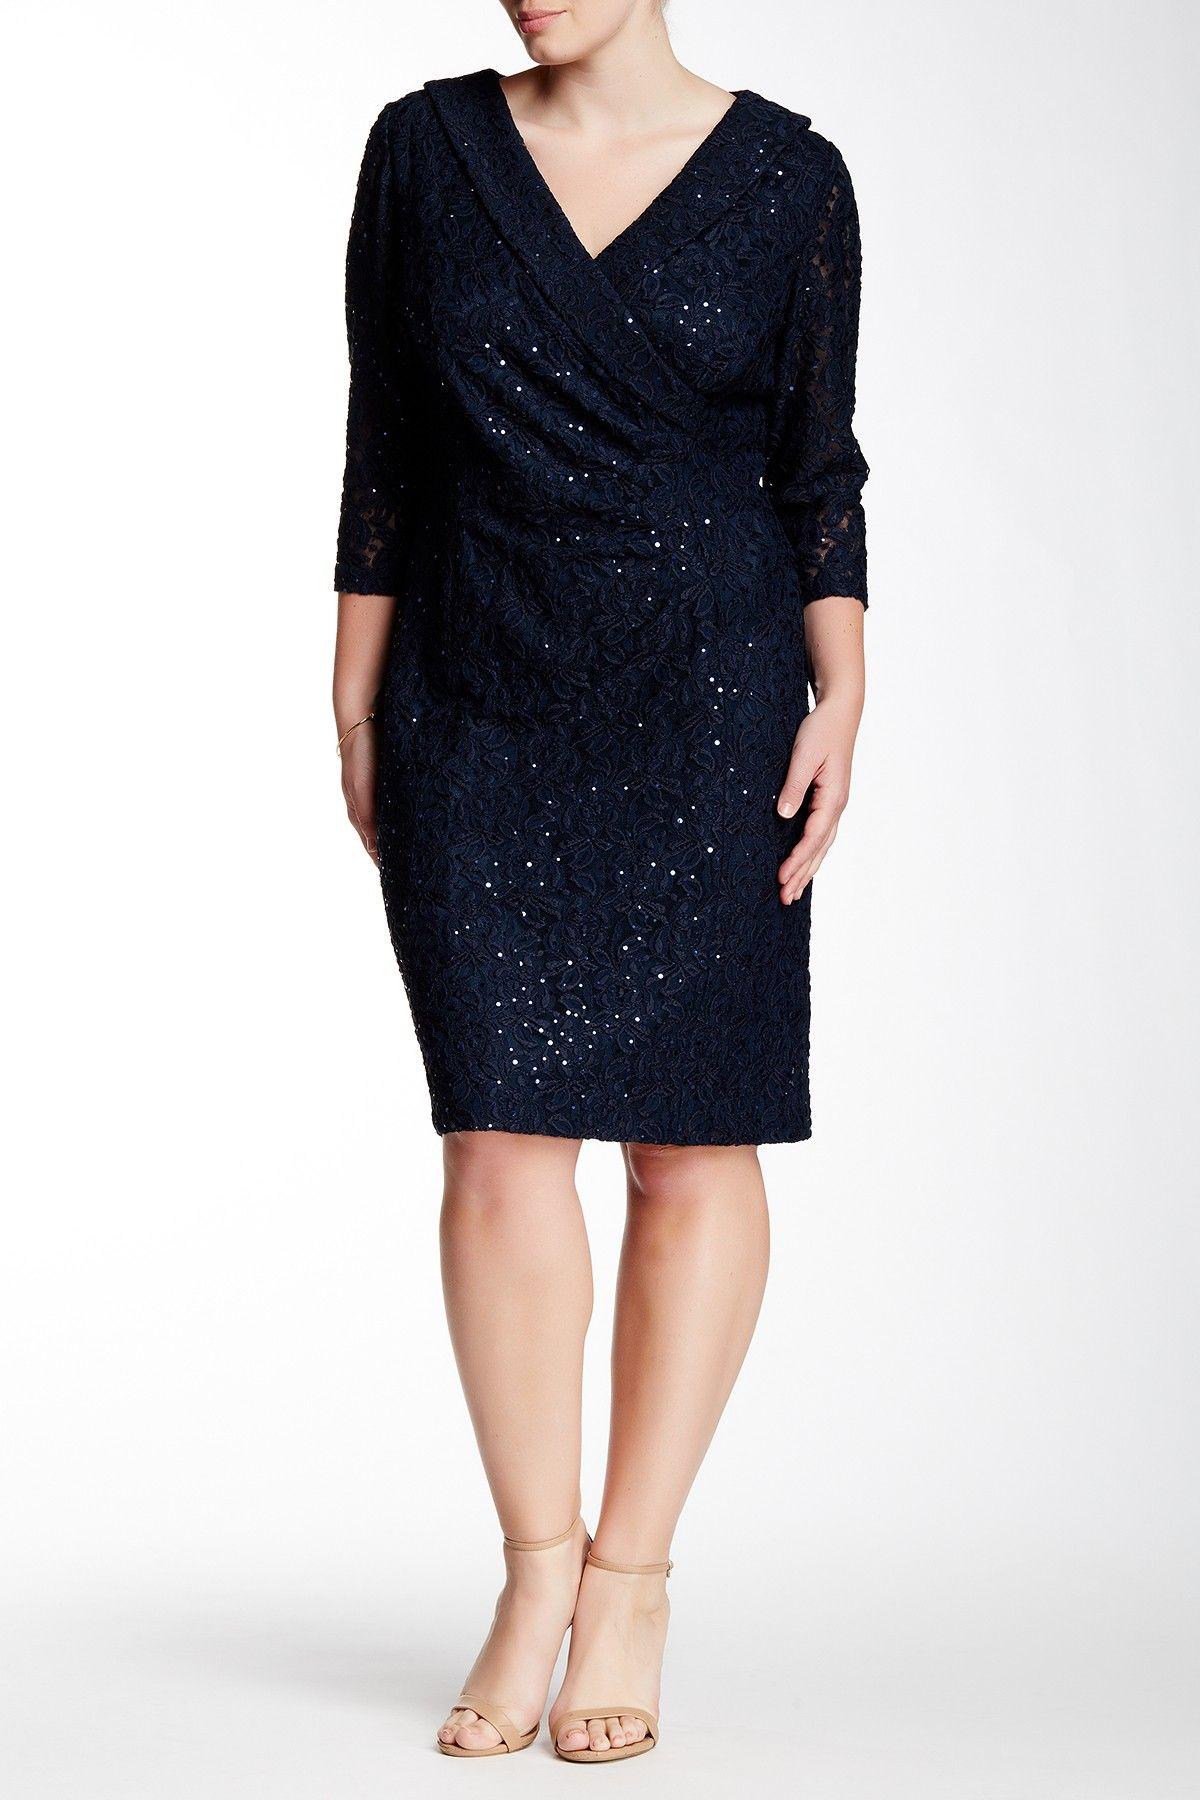 Shawl Lace Sheath Dress (Plus Size) by Tahari on @nordstrom_rack